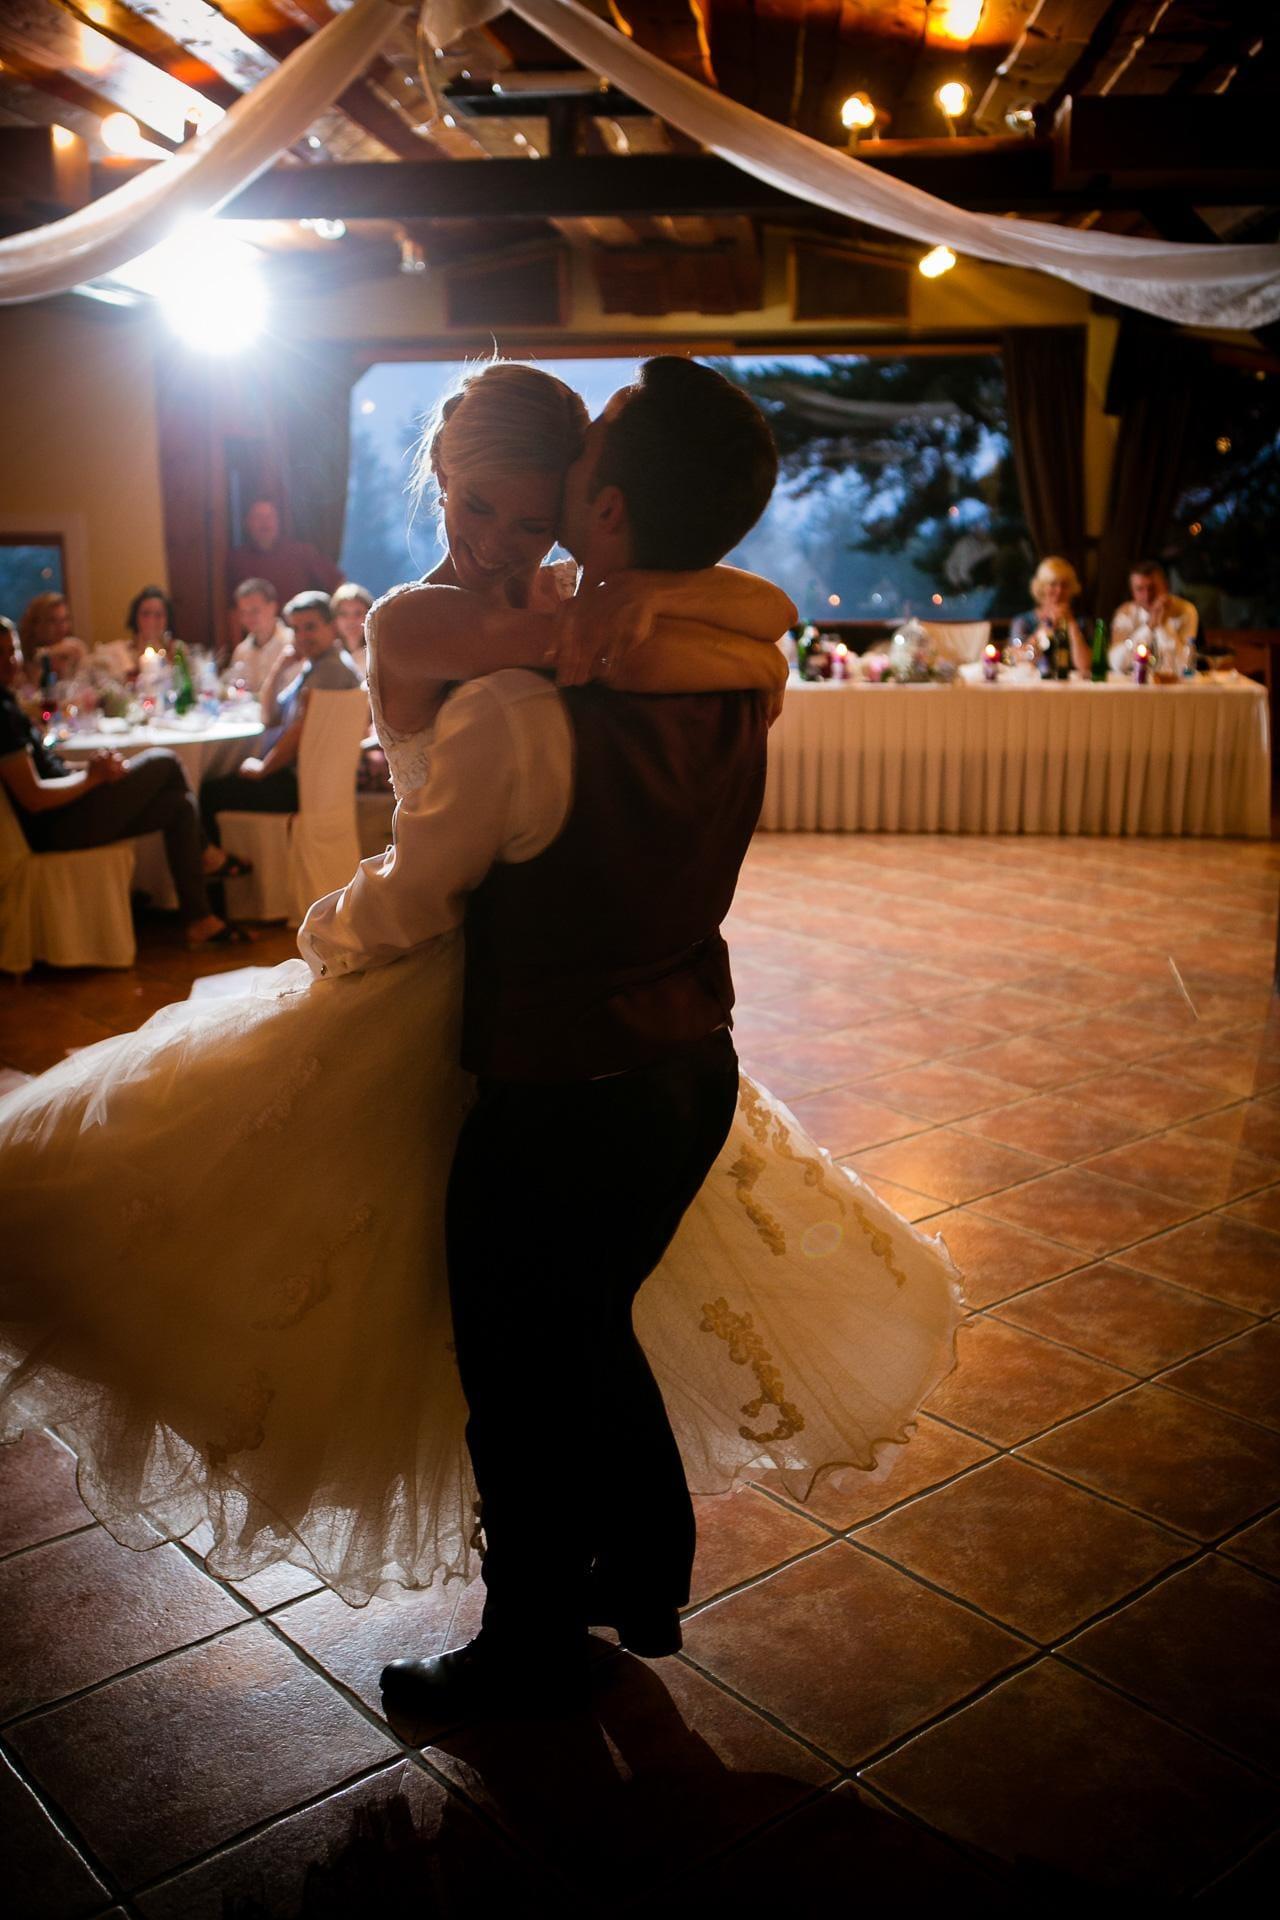 fotografzaporokocena sparkle shinylove love storyaboutlove lovestory duality dvojina, fotozate@tadejbernik.com. +386 31 413 654,, fotograf poroka, fotograf za poroko, fotografiranje poroke, groom, hochzeit, hochzeitsfotograf, hochzeitsfotos, hochzeitsreportage,